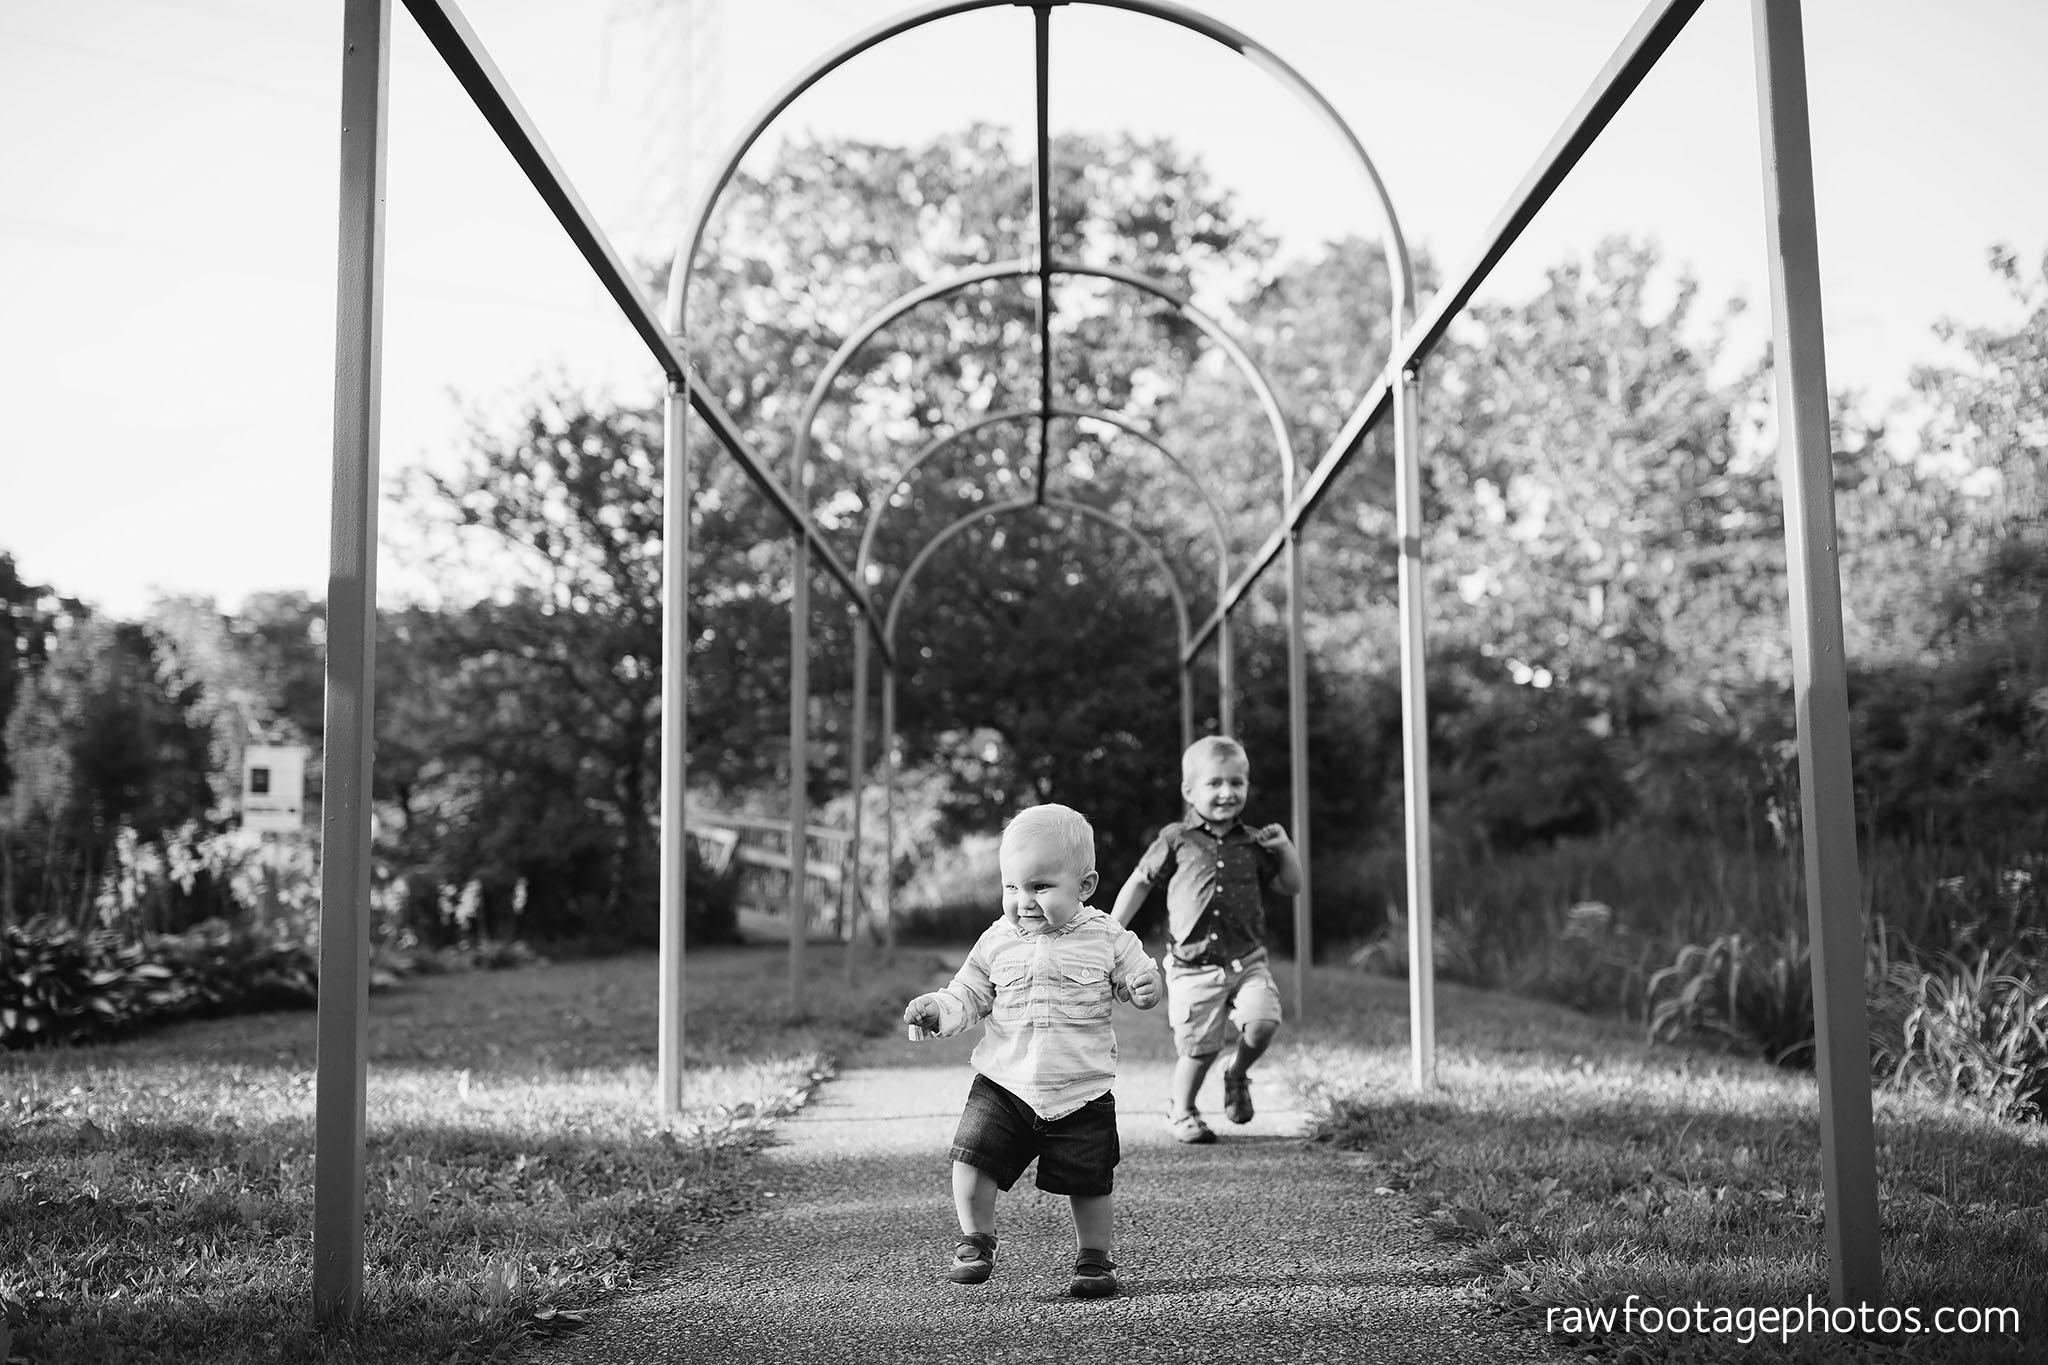 london_ontario_family_photographer-waterworks_park-st_thomas_ontario-raw_footage_photography005.jpg